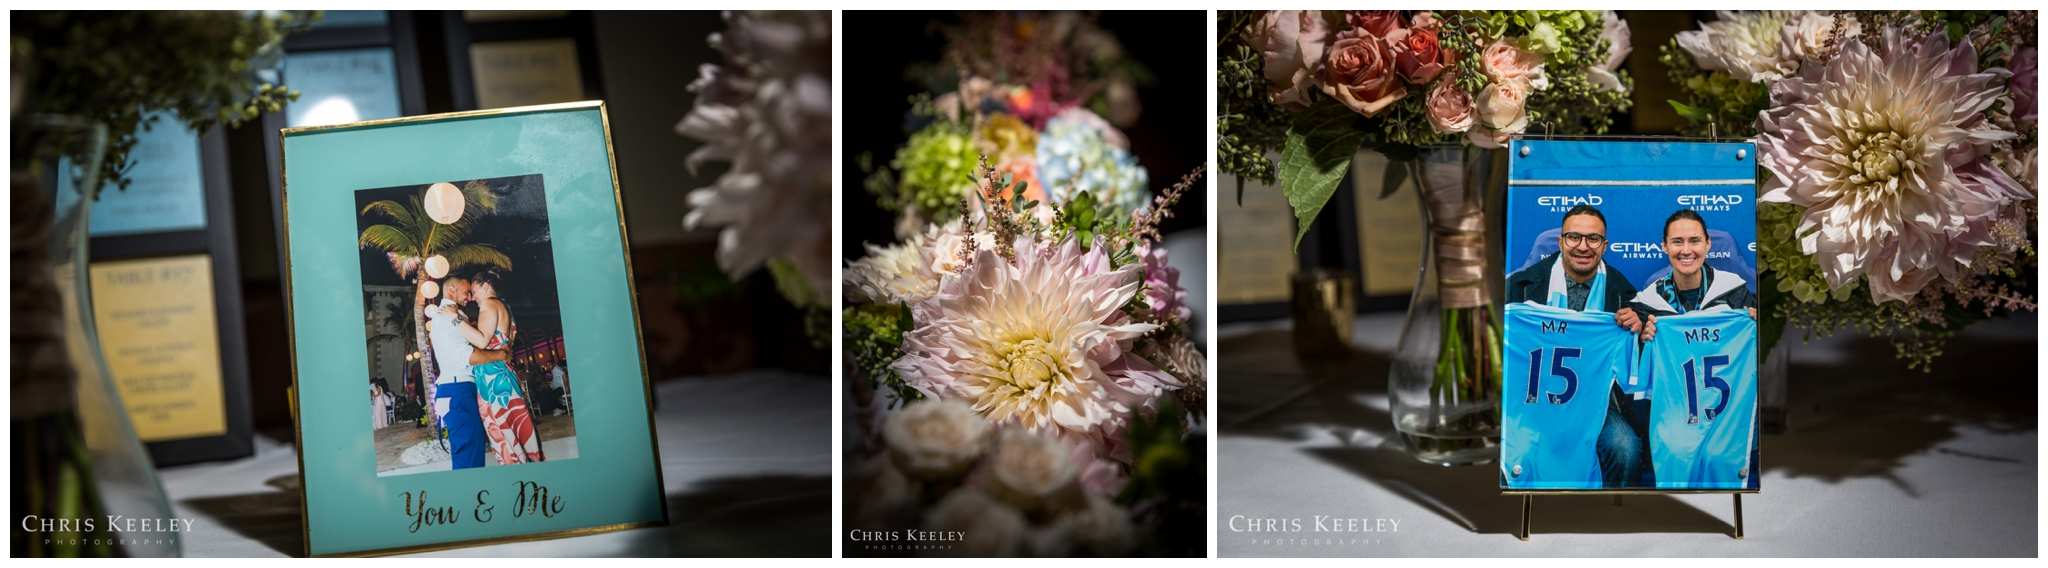 grace-restaurant-portland-maine-wedding-photographer-chris-keeley-59.jpg